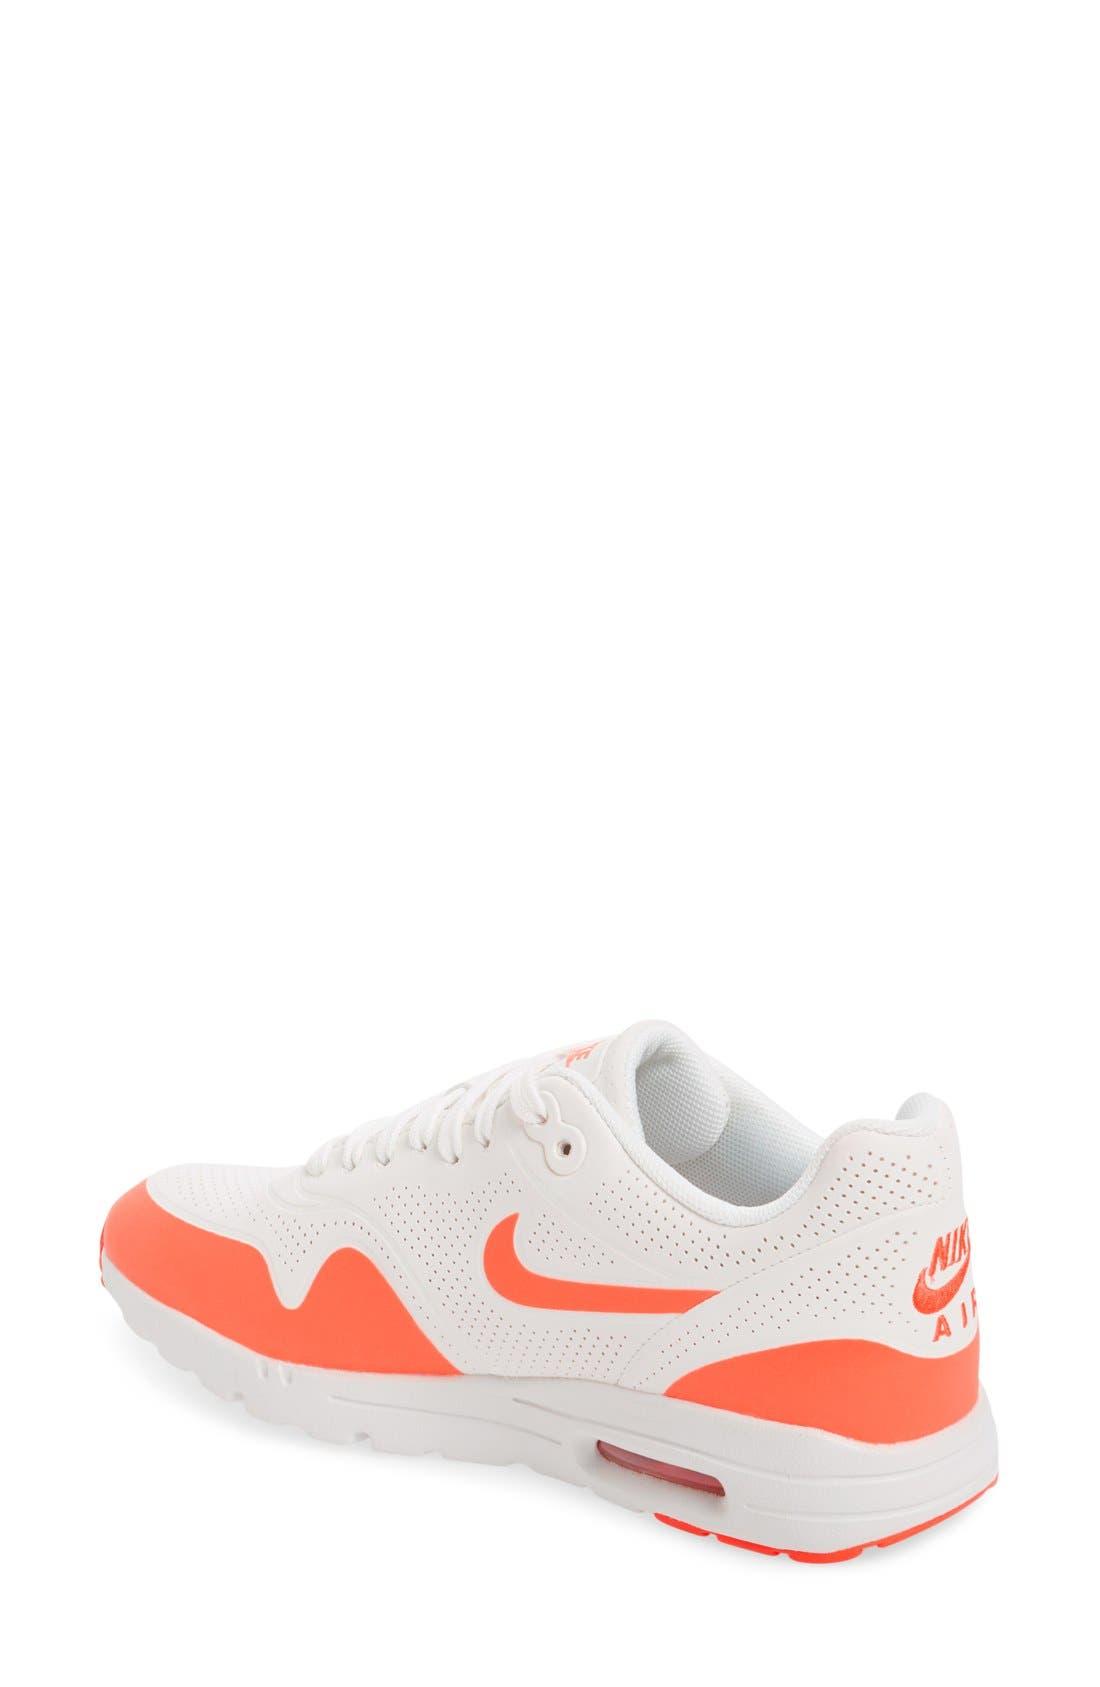 ,                             'Air Max 1 - Ultra Moire' Sneaker,                             Alternate thumbnail 128, color,                             830